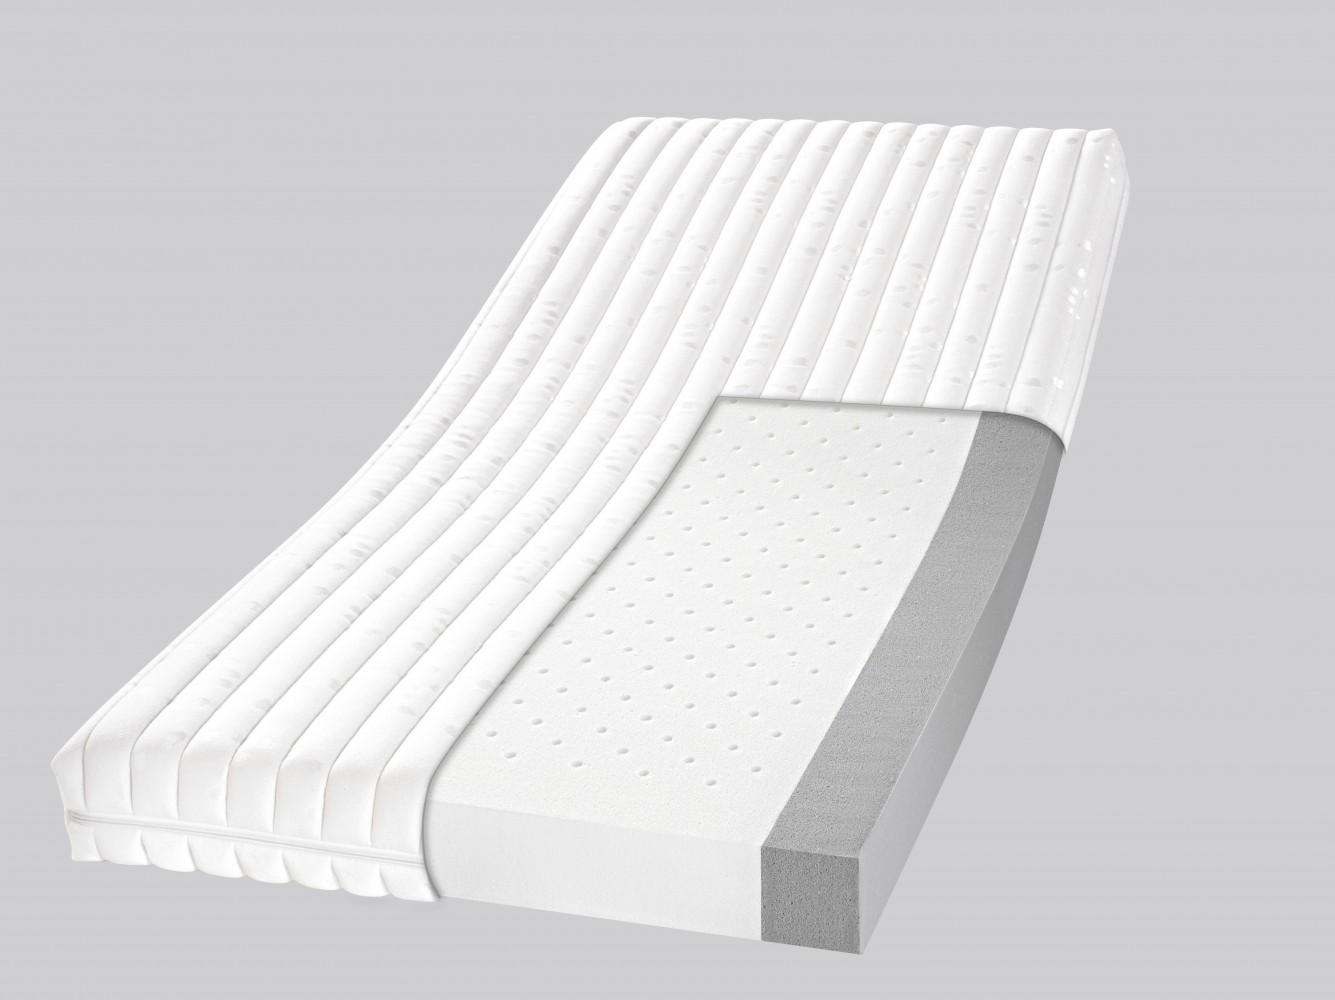 badenia irisette badenia irisette vitaflex flextube. Black Bedroom Furniture Sets. Home Design Ideas